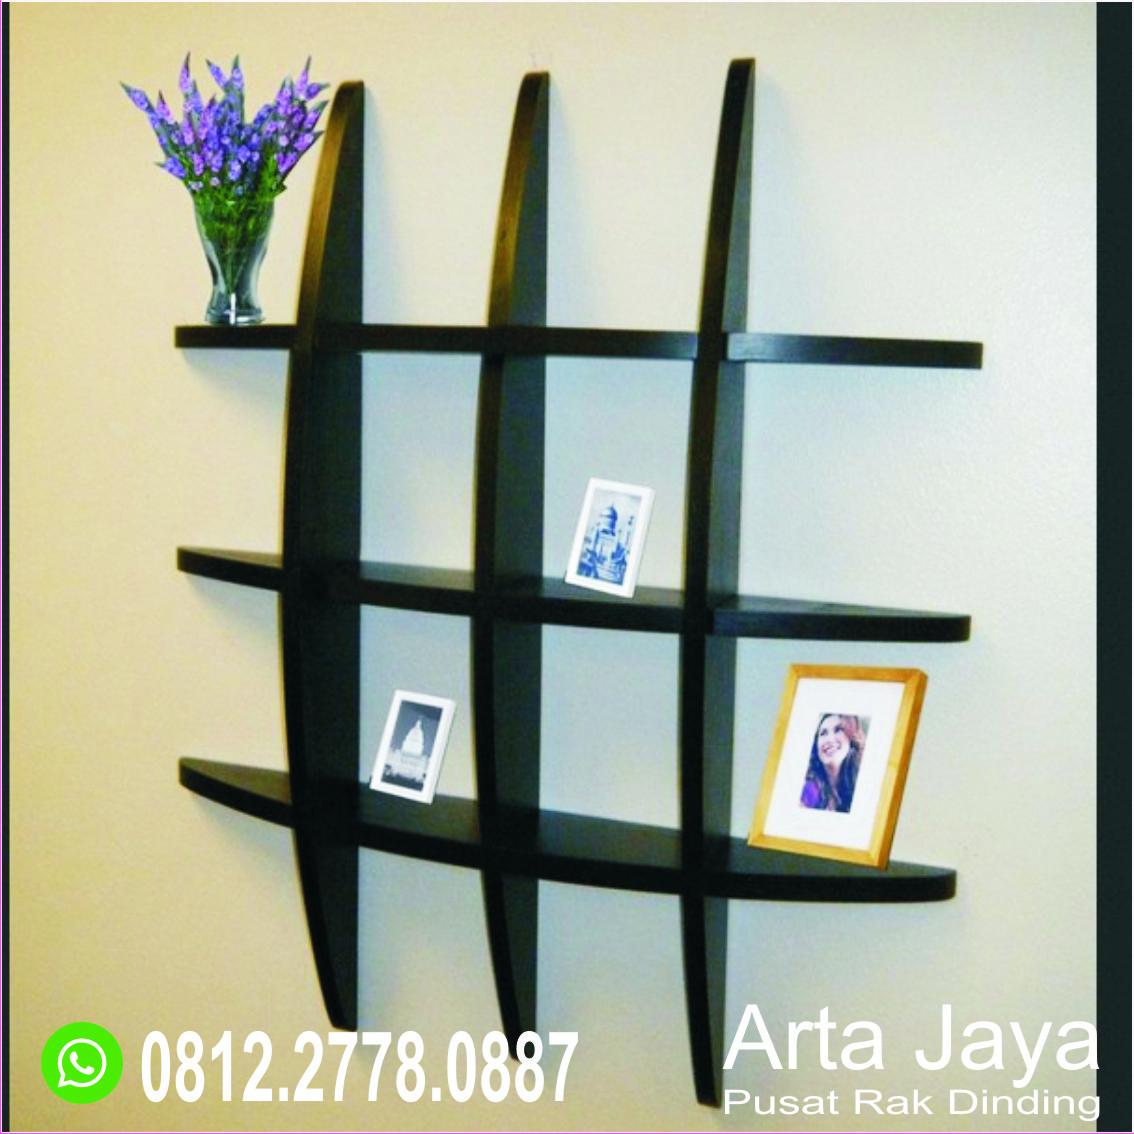 Large Rectangle black wire wood  retro wall shelf unit shelving display home